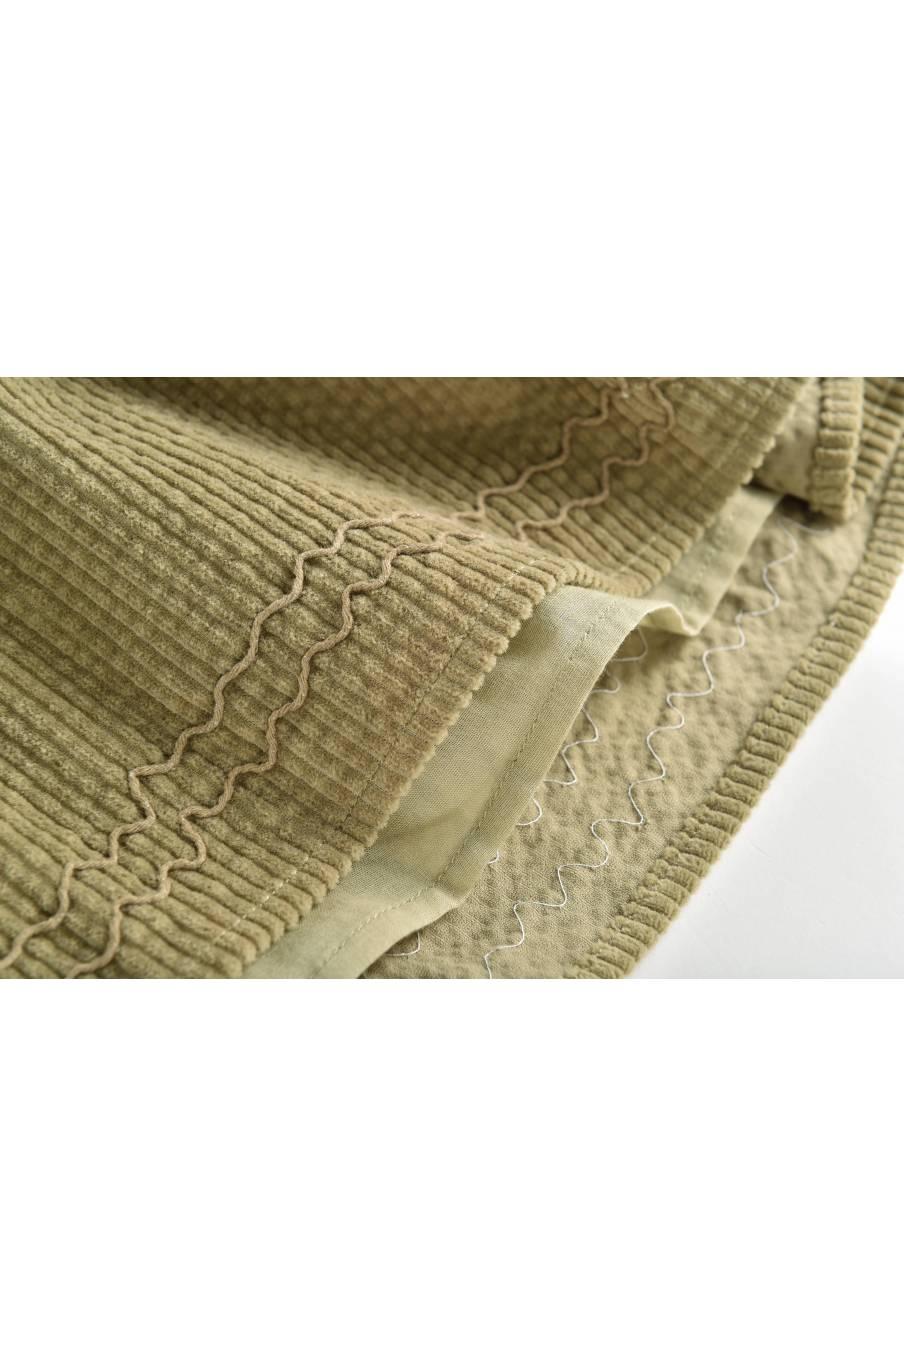 boheme chic vintage jupe bébé fille eleonor khaki velvet